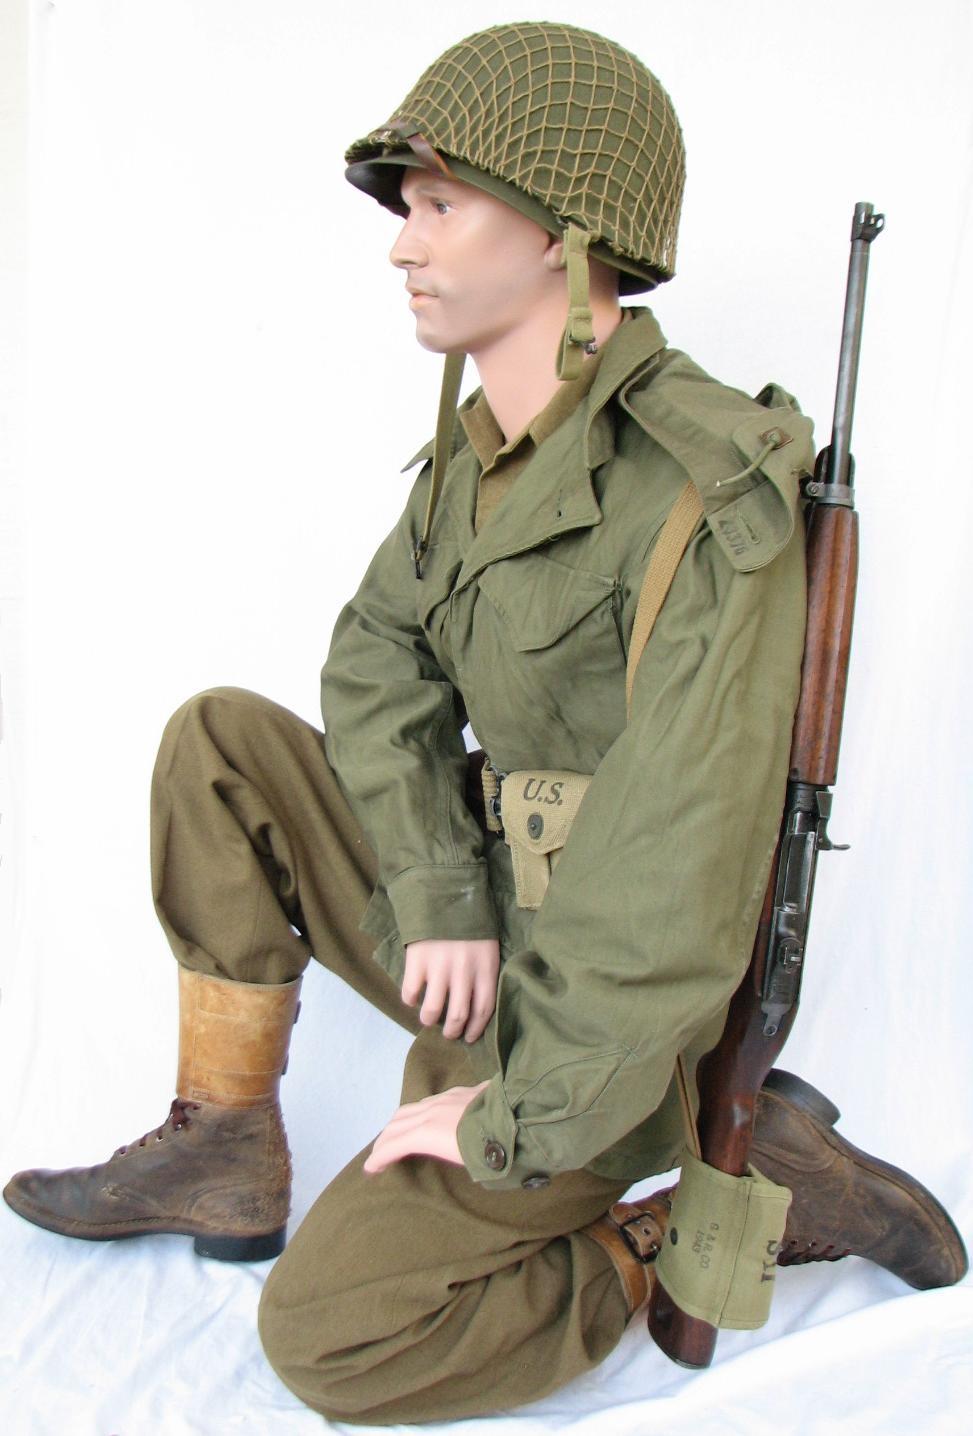 Military Kneeling Mannequin MSG01 - Yanks Mannequins, LLC